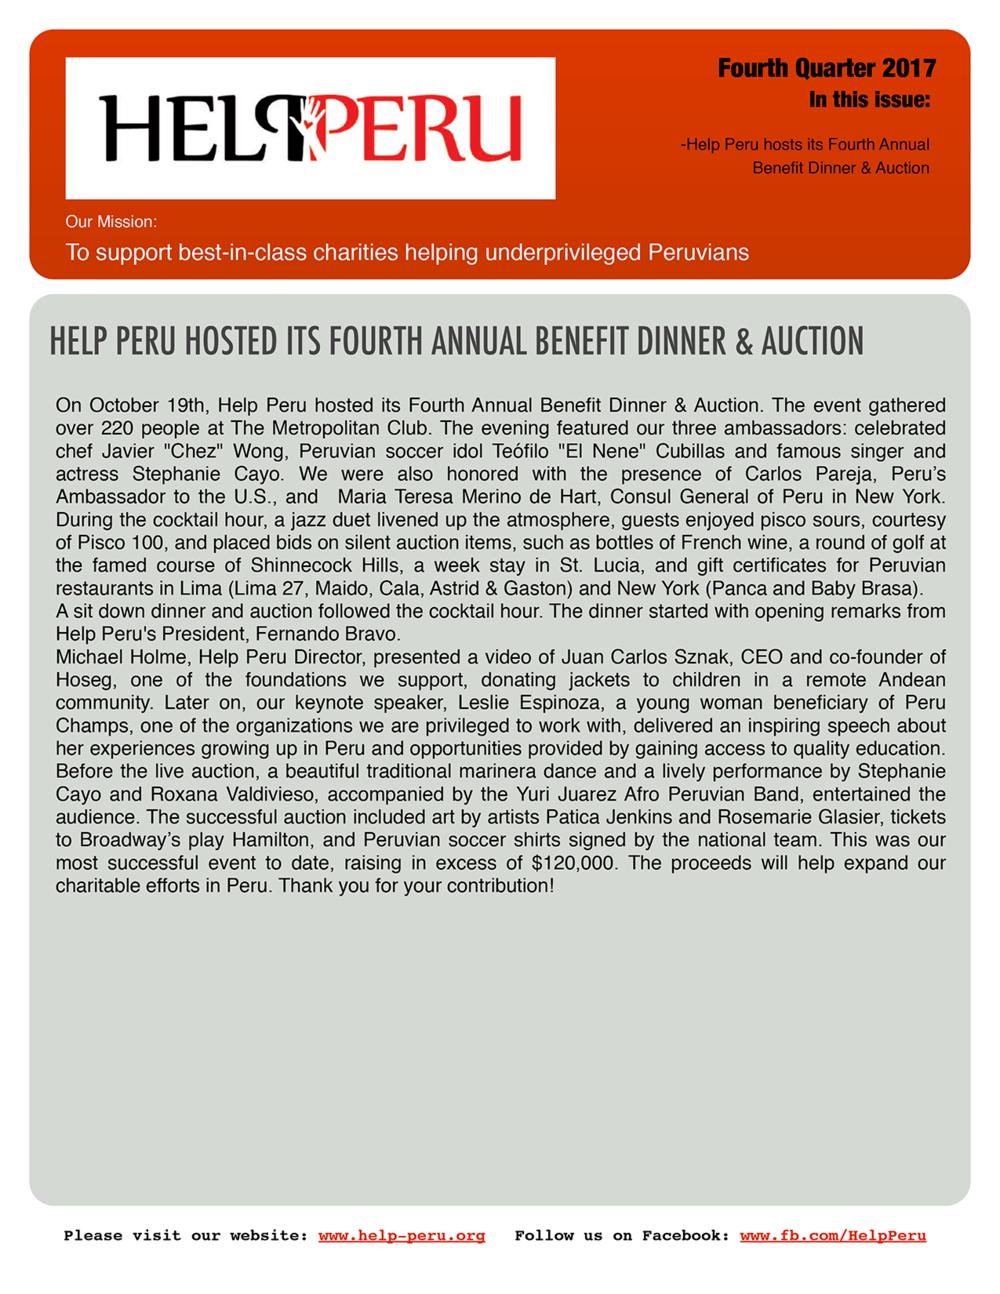 Help Peru Bulletin 4Q 2017